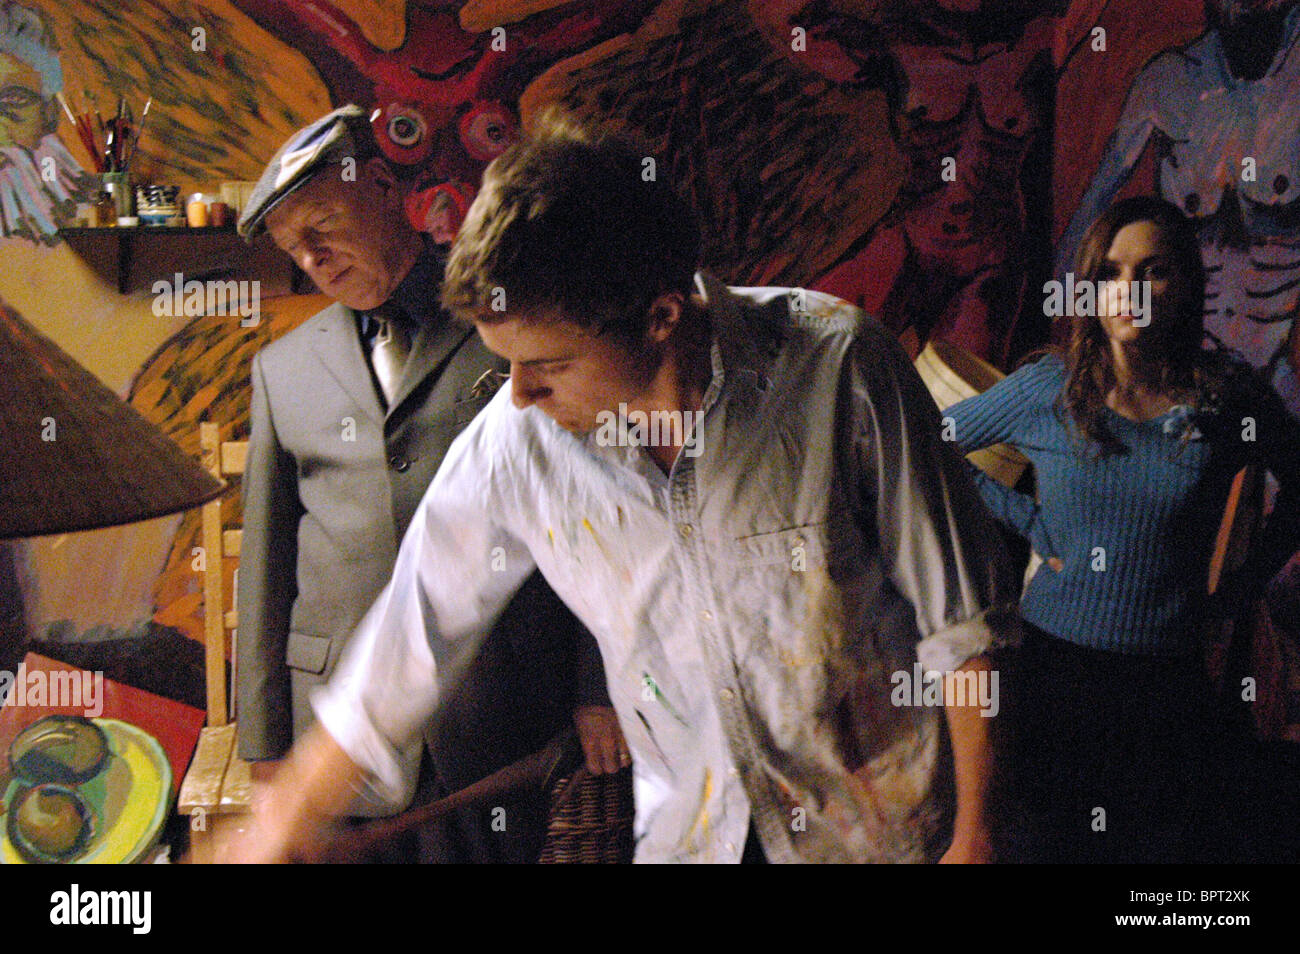 JASON BARRY & PRIMAEXCEL ENCORE LA VIE; (2007) Photo Stock